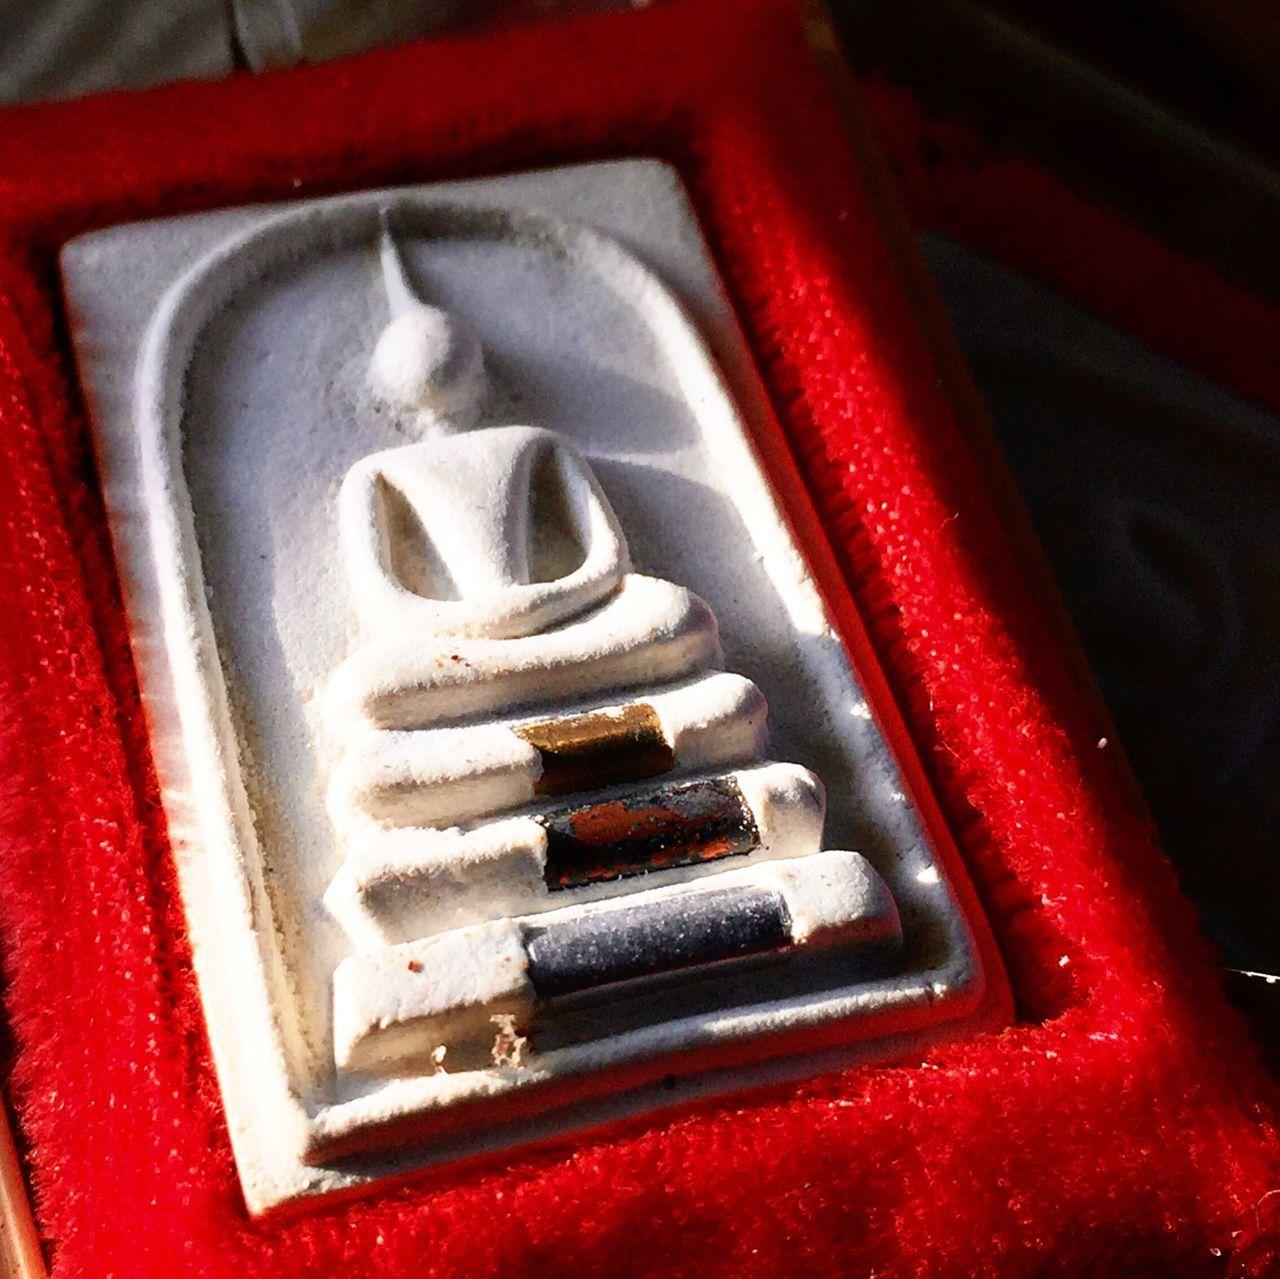 No People Close-up Indoors  Day Thailand Holy Art Buddha Buddhism Buddha Art Charm Holy Souvenir